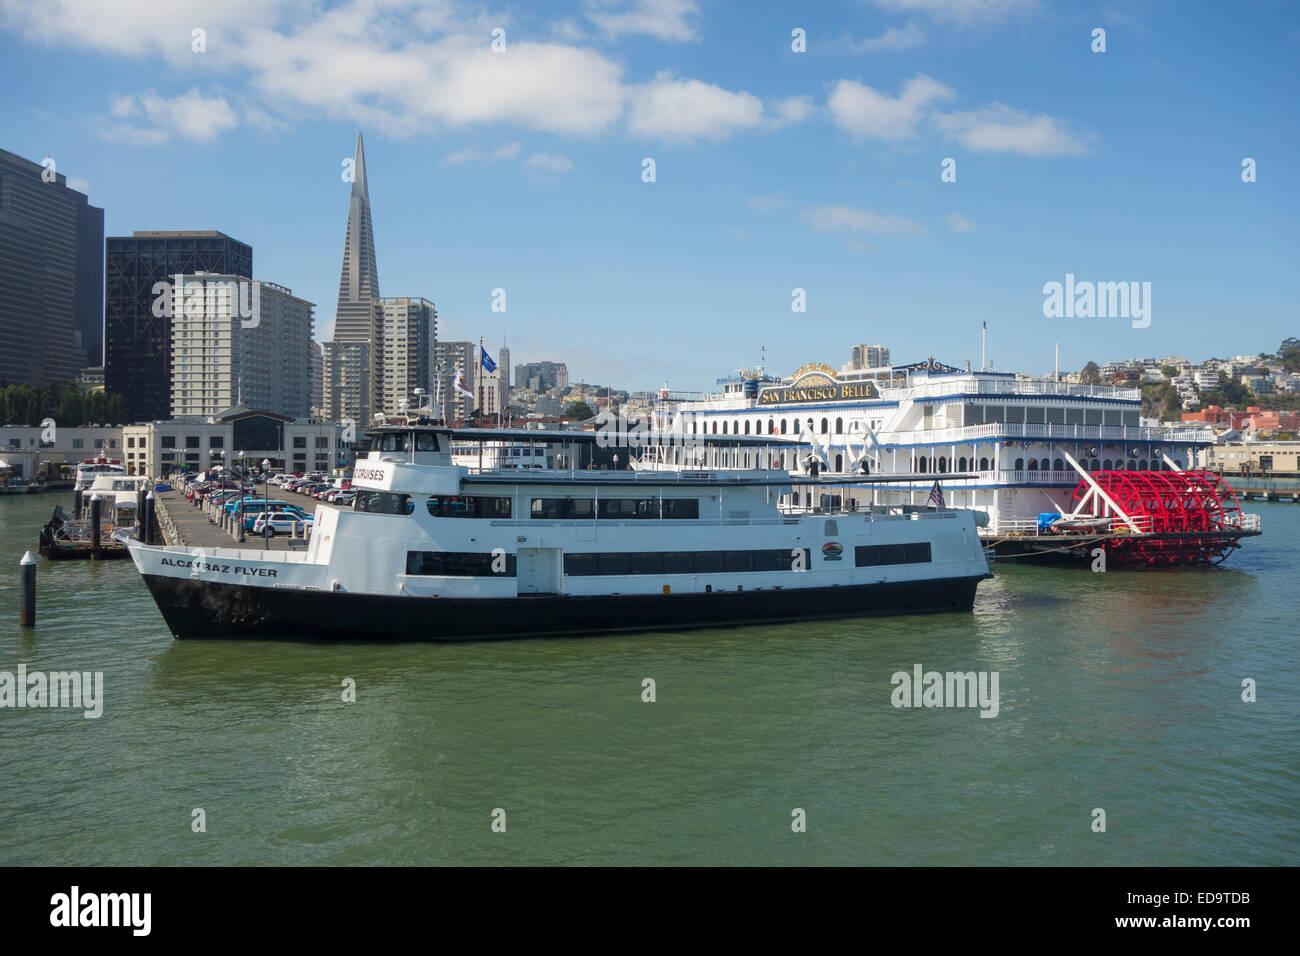 Alcatraz flyer tour boat cruises in San Francisco CA - Stock Image